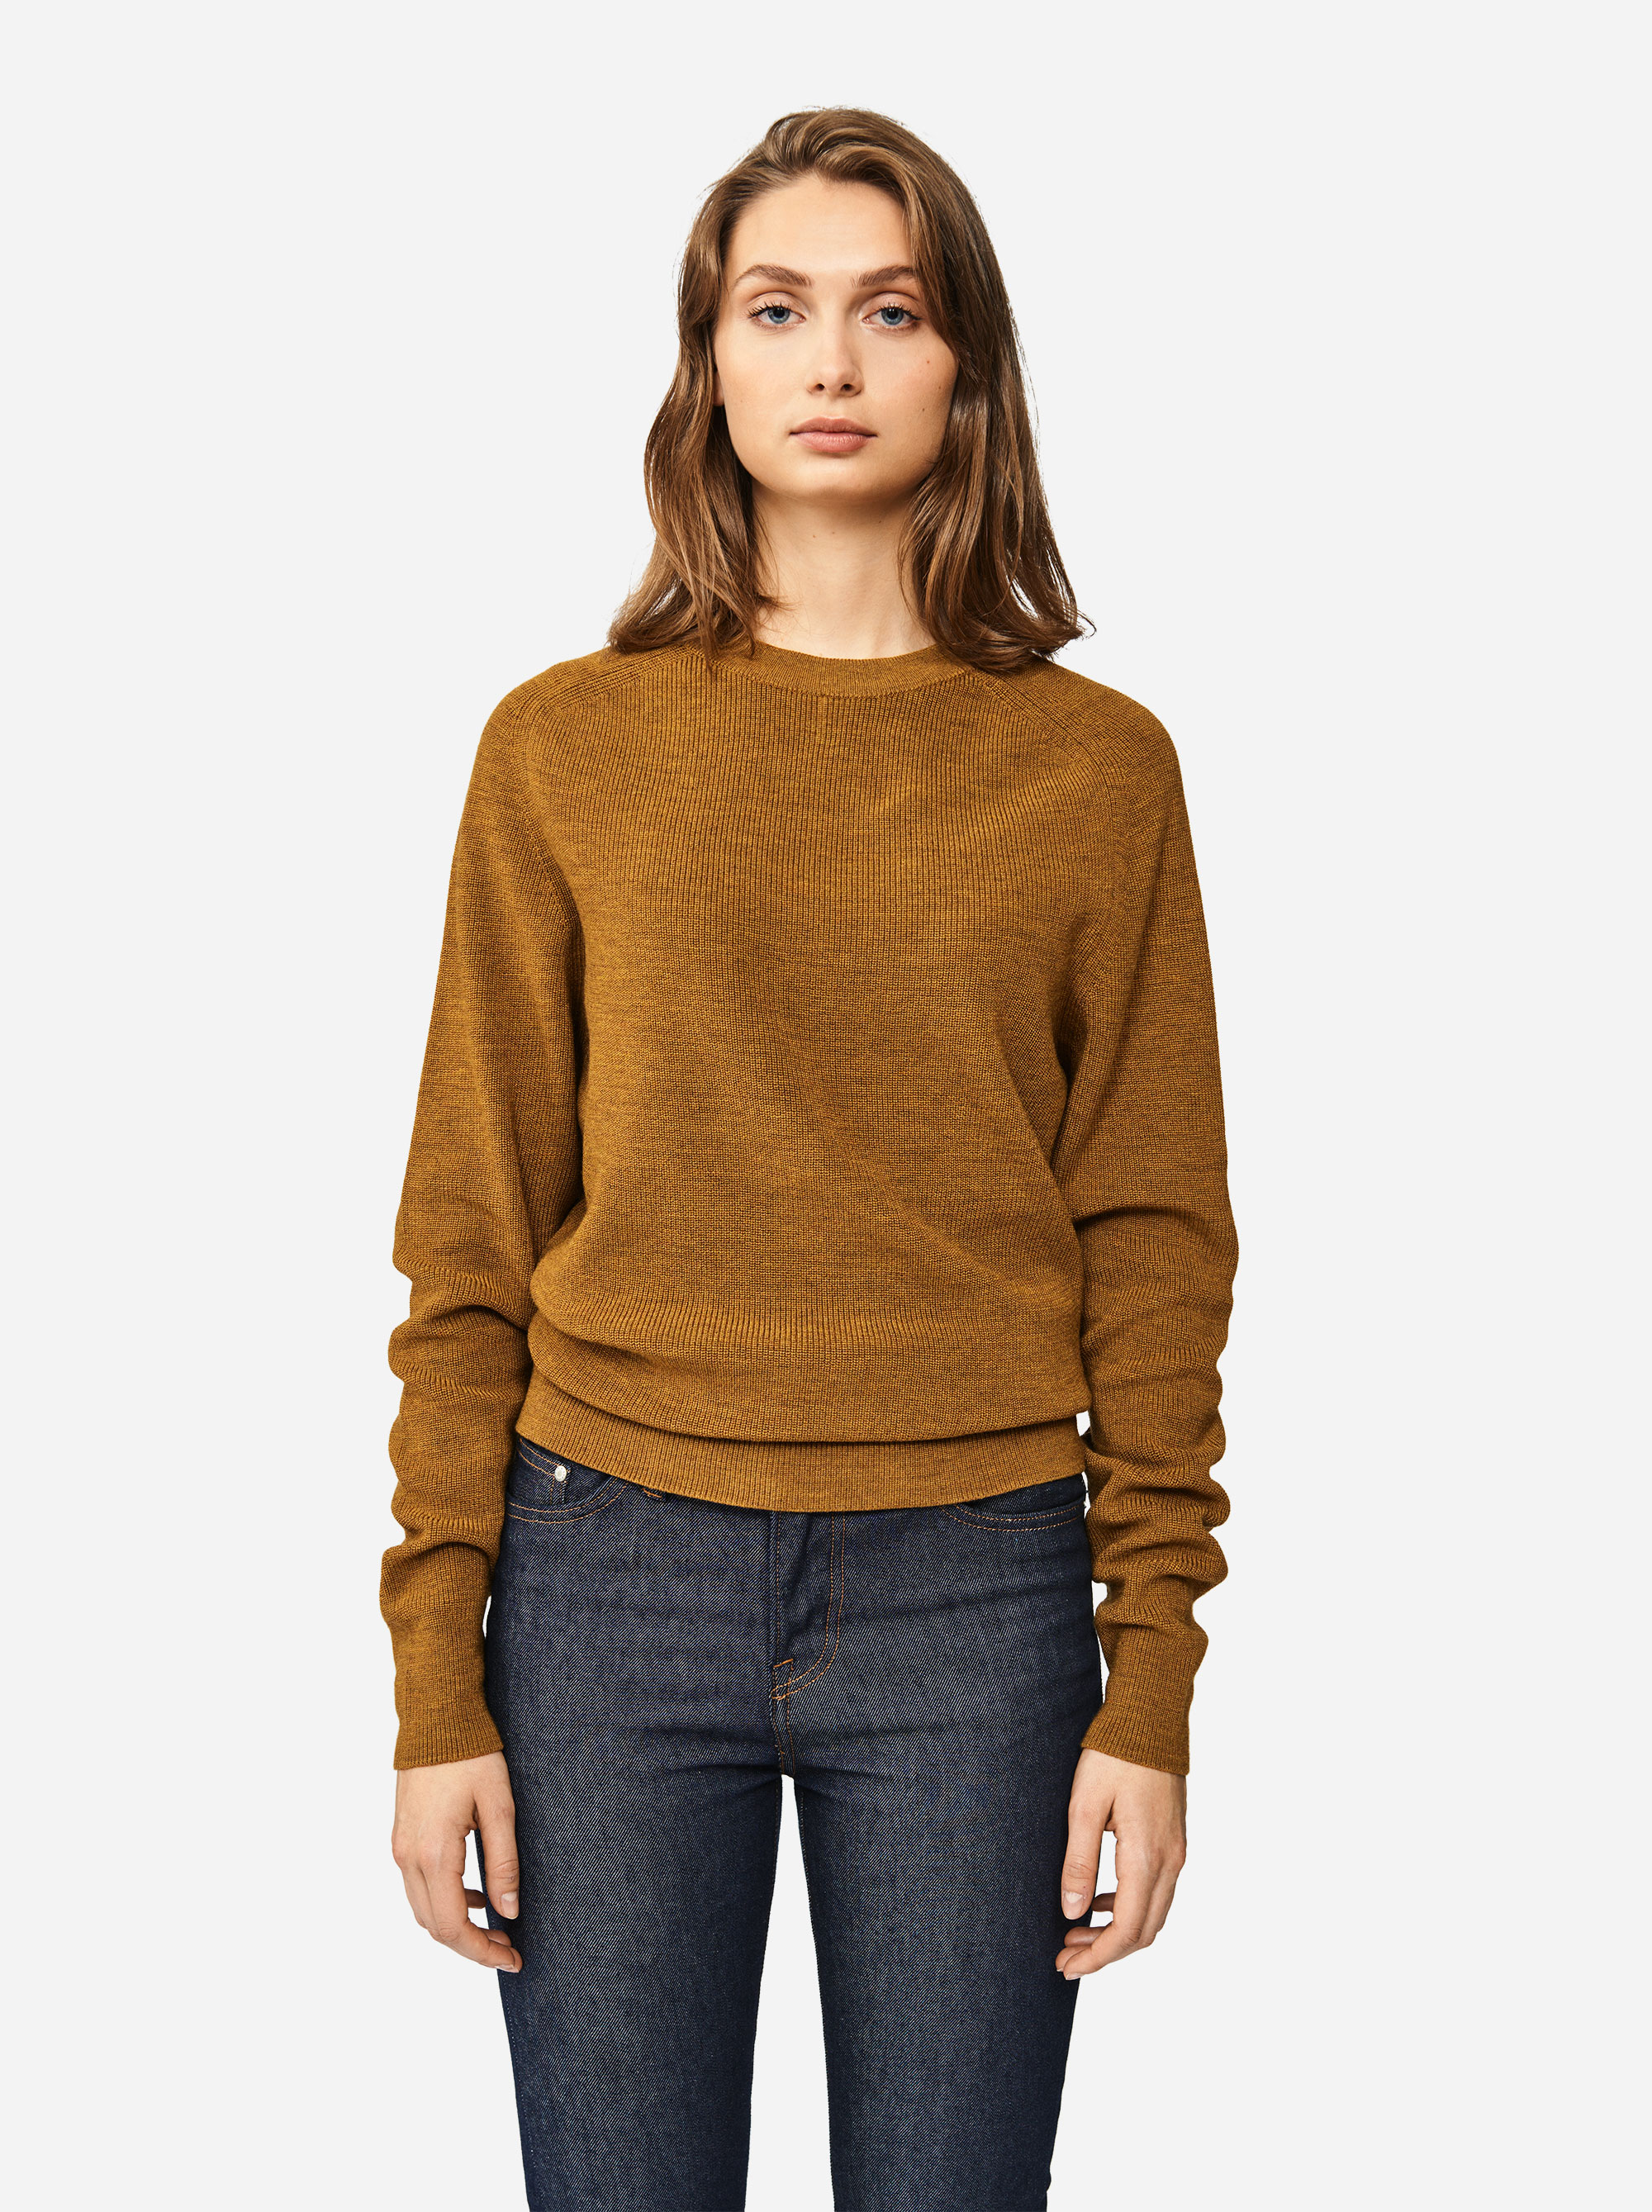 Teym - Crewneck - The Merino Sweater - Women - Mustard - 3